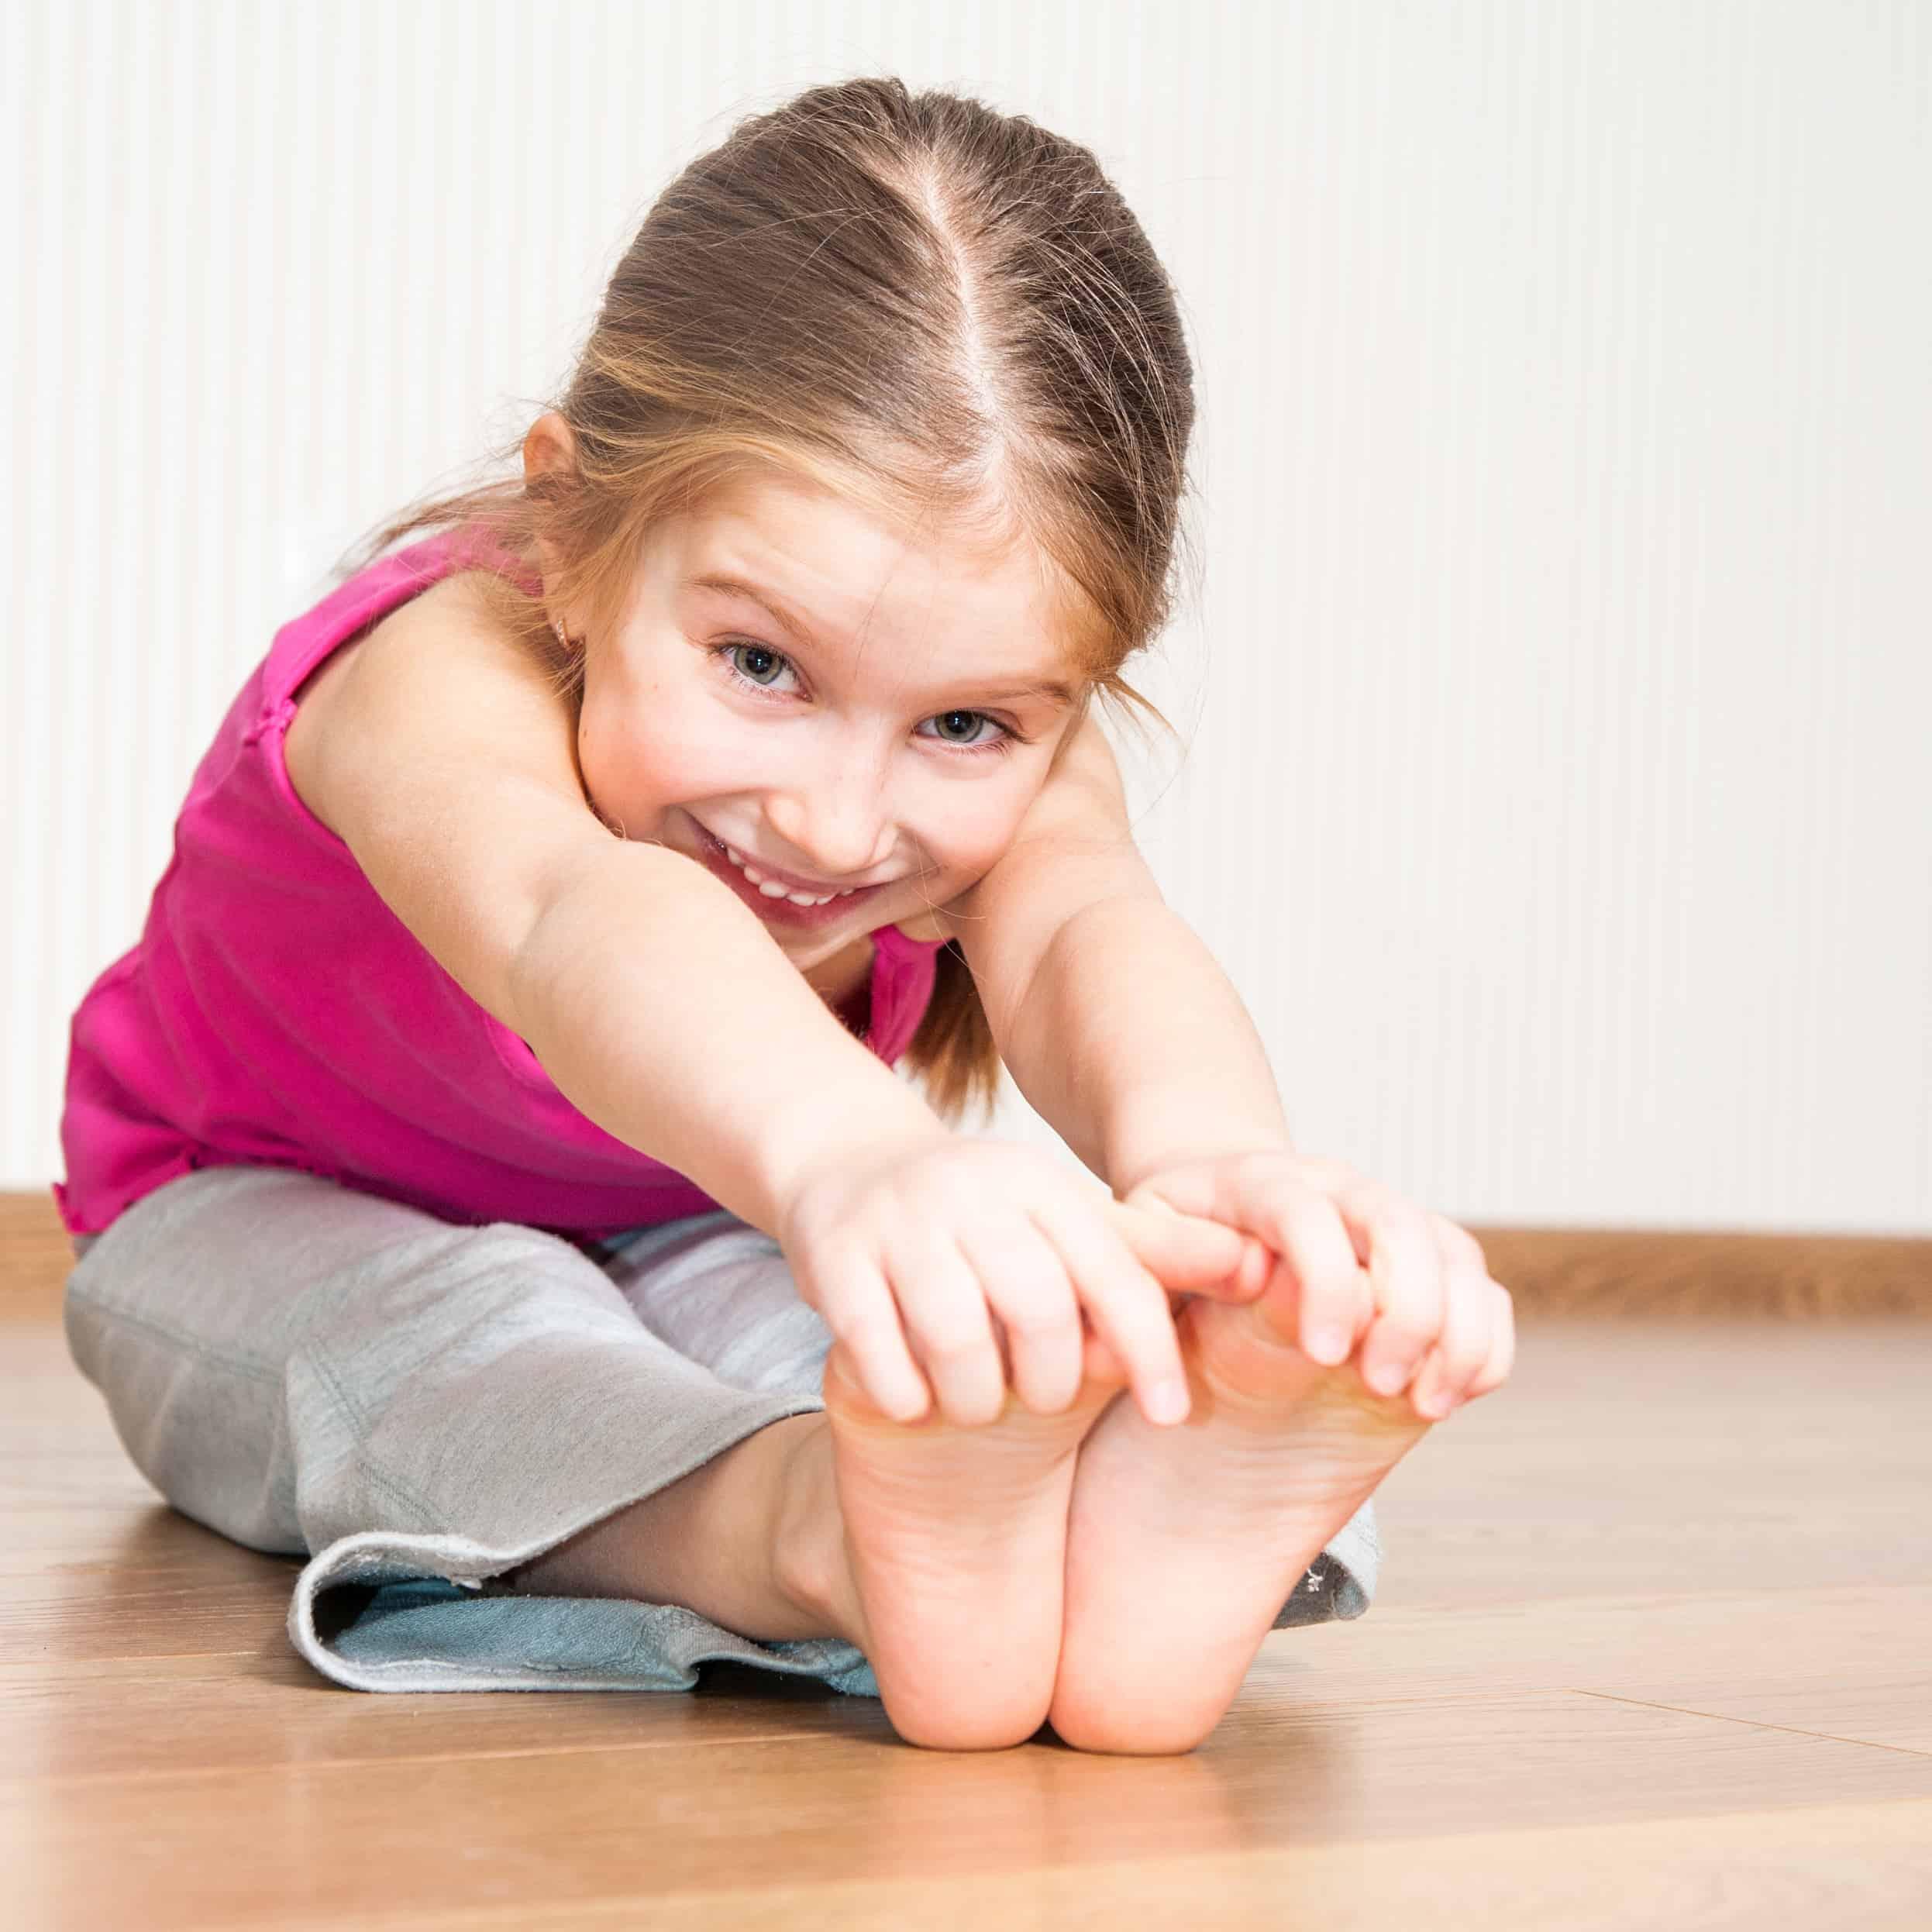 Yogalehrerausbildung, Ausbildung Yogalehrer, Yogalehrer Ausbildung,